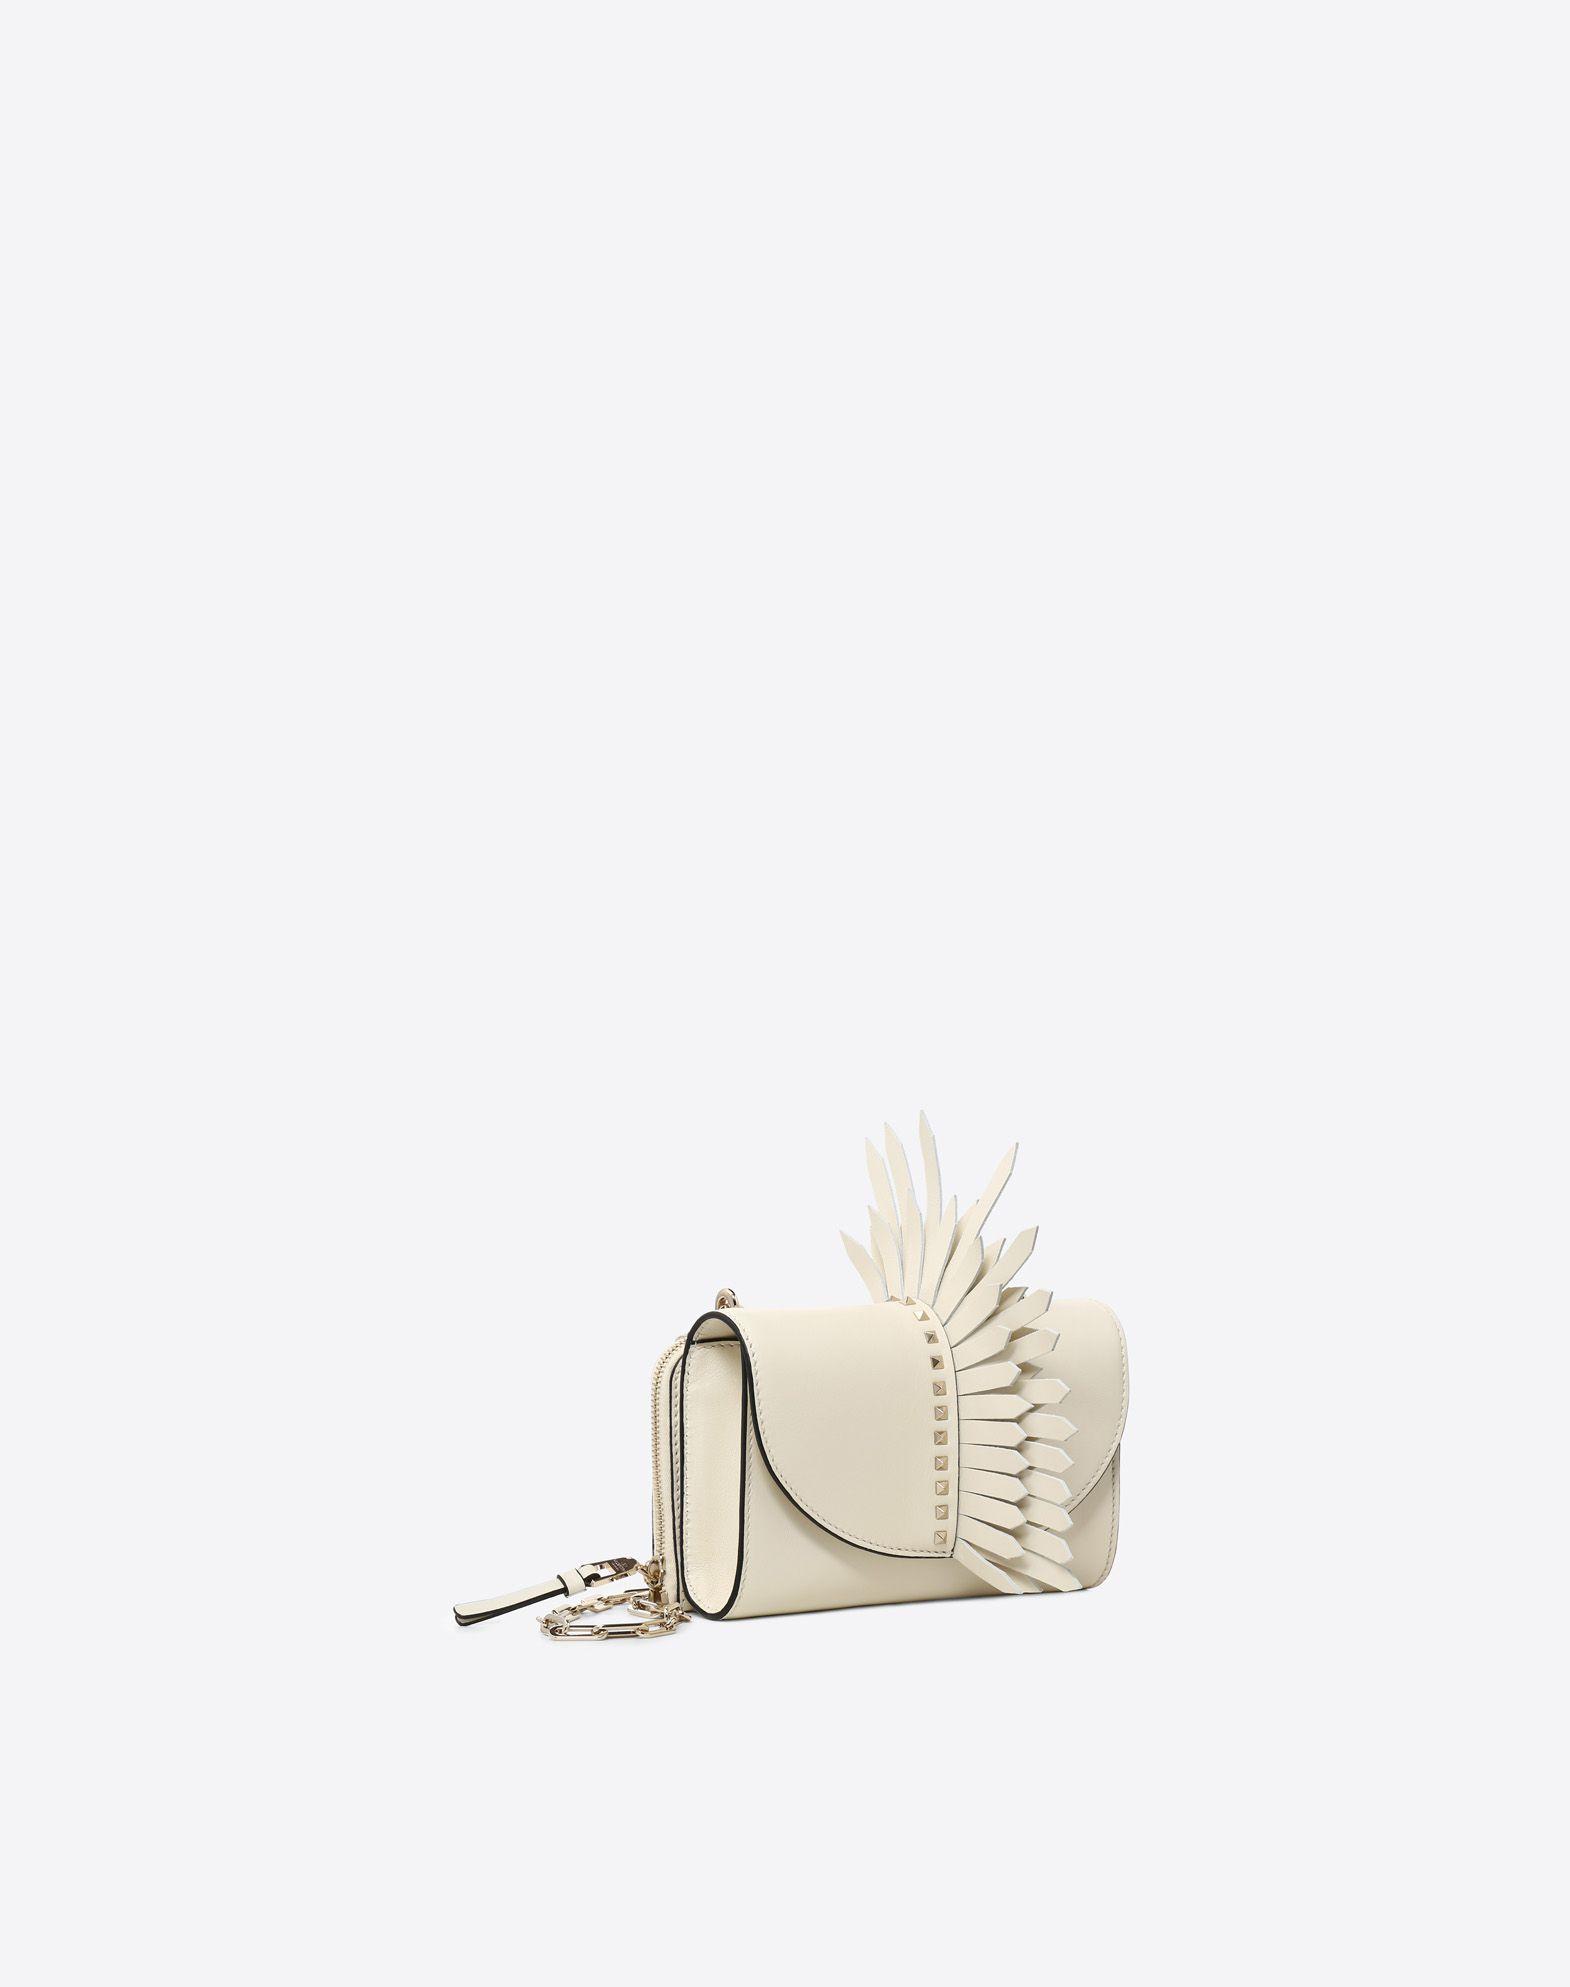 VALENTINO GARAVANI Shoulder Bag CROSS BODY BAG D r